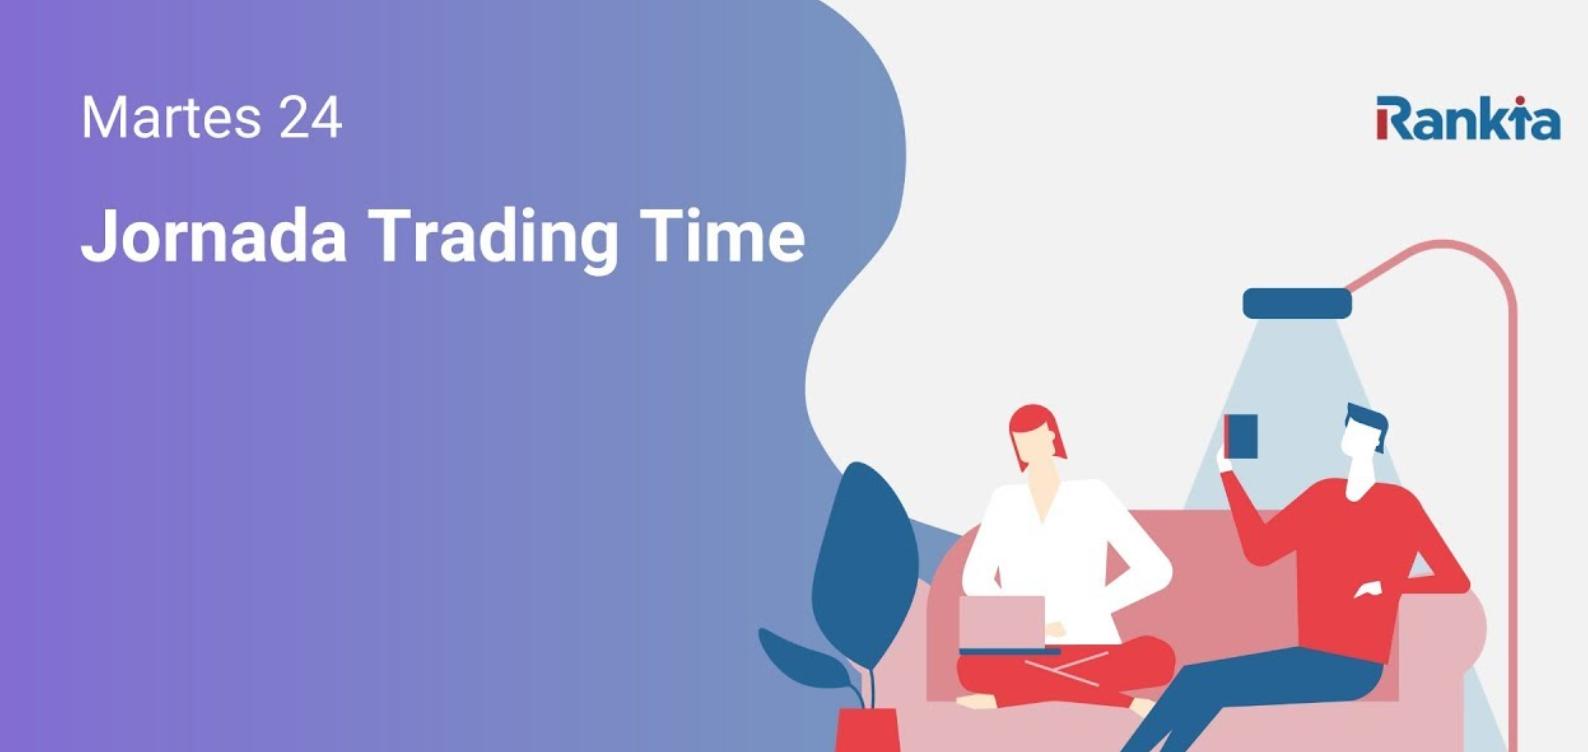 #YomequedoenRankia (24 de marzo): Trading Time